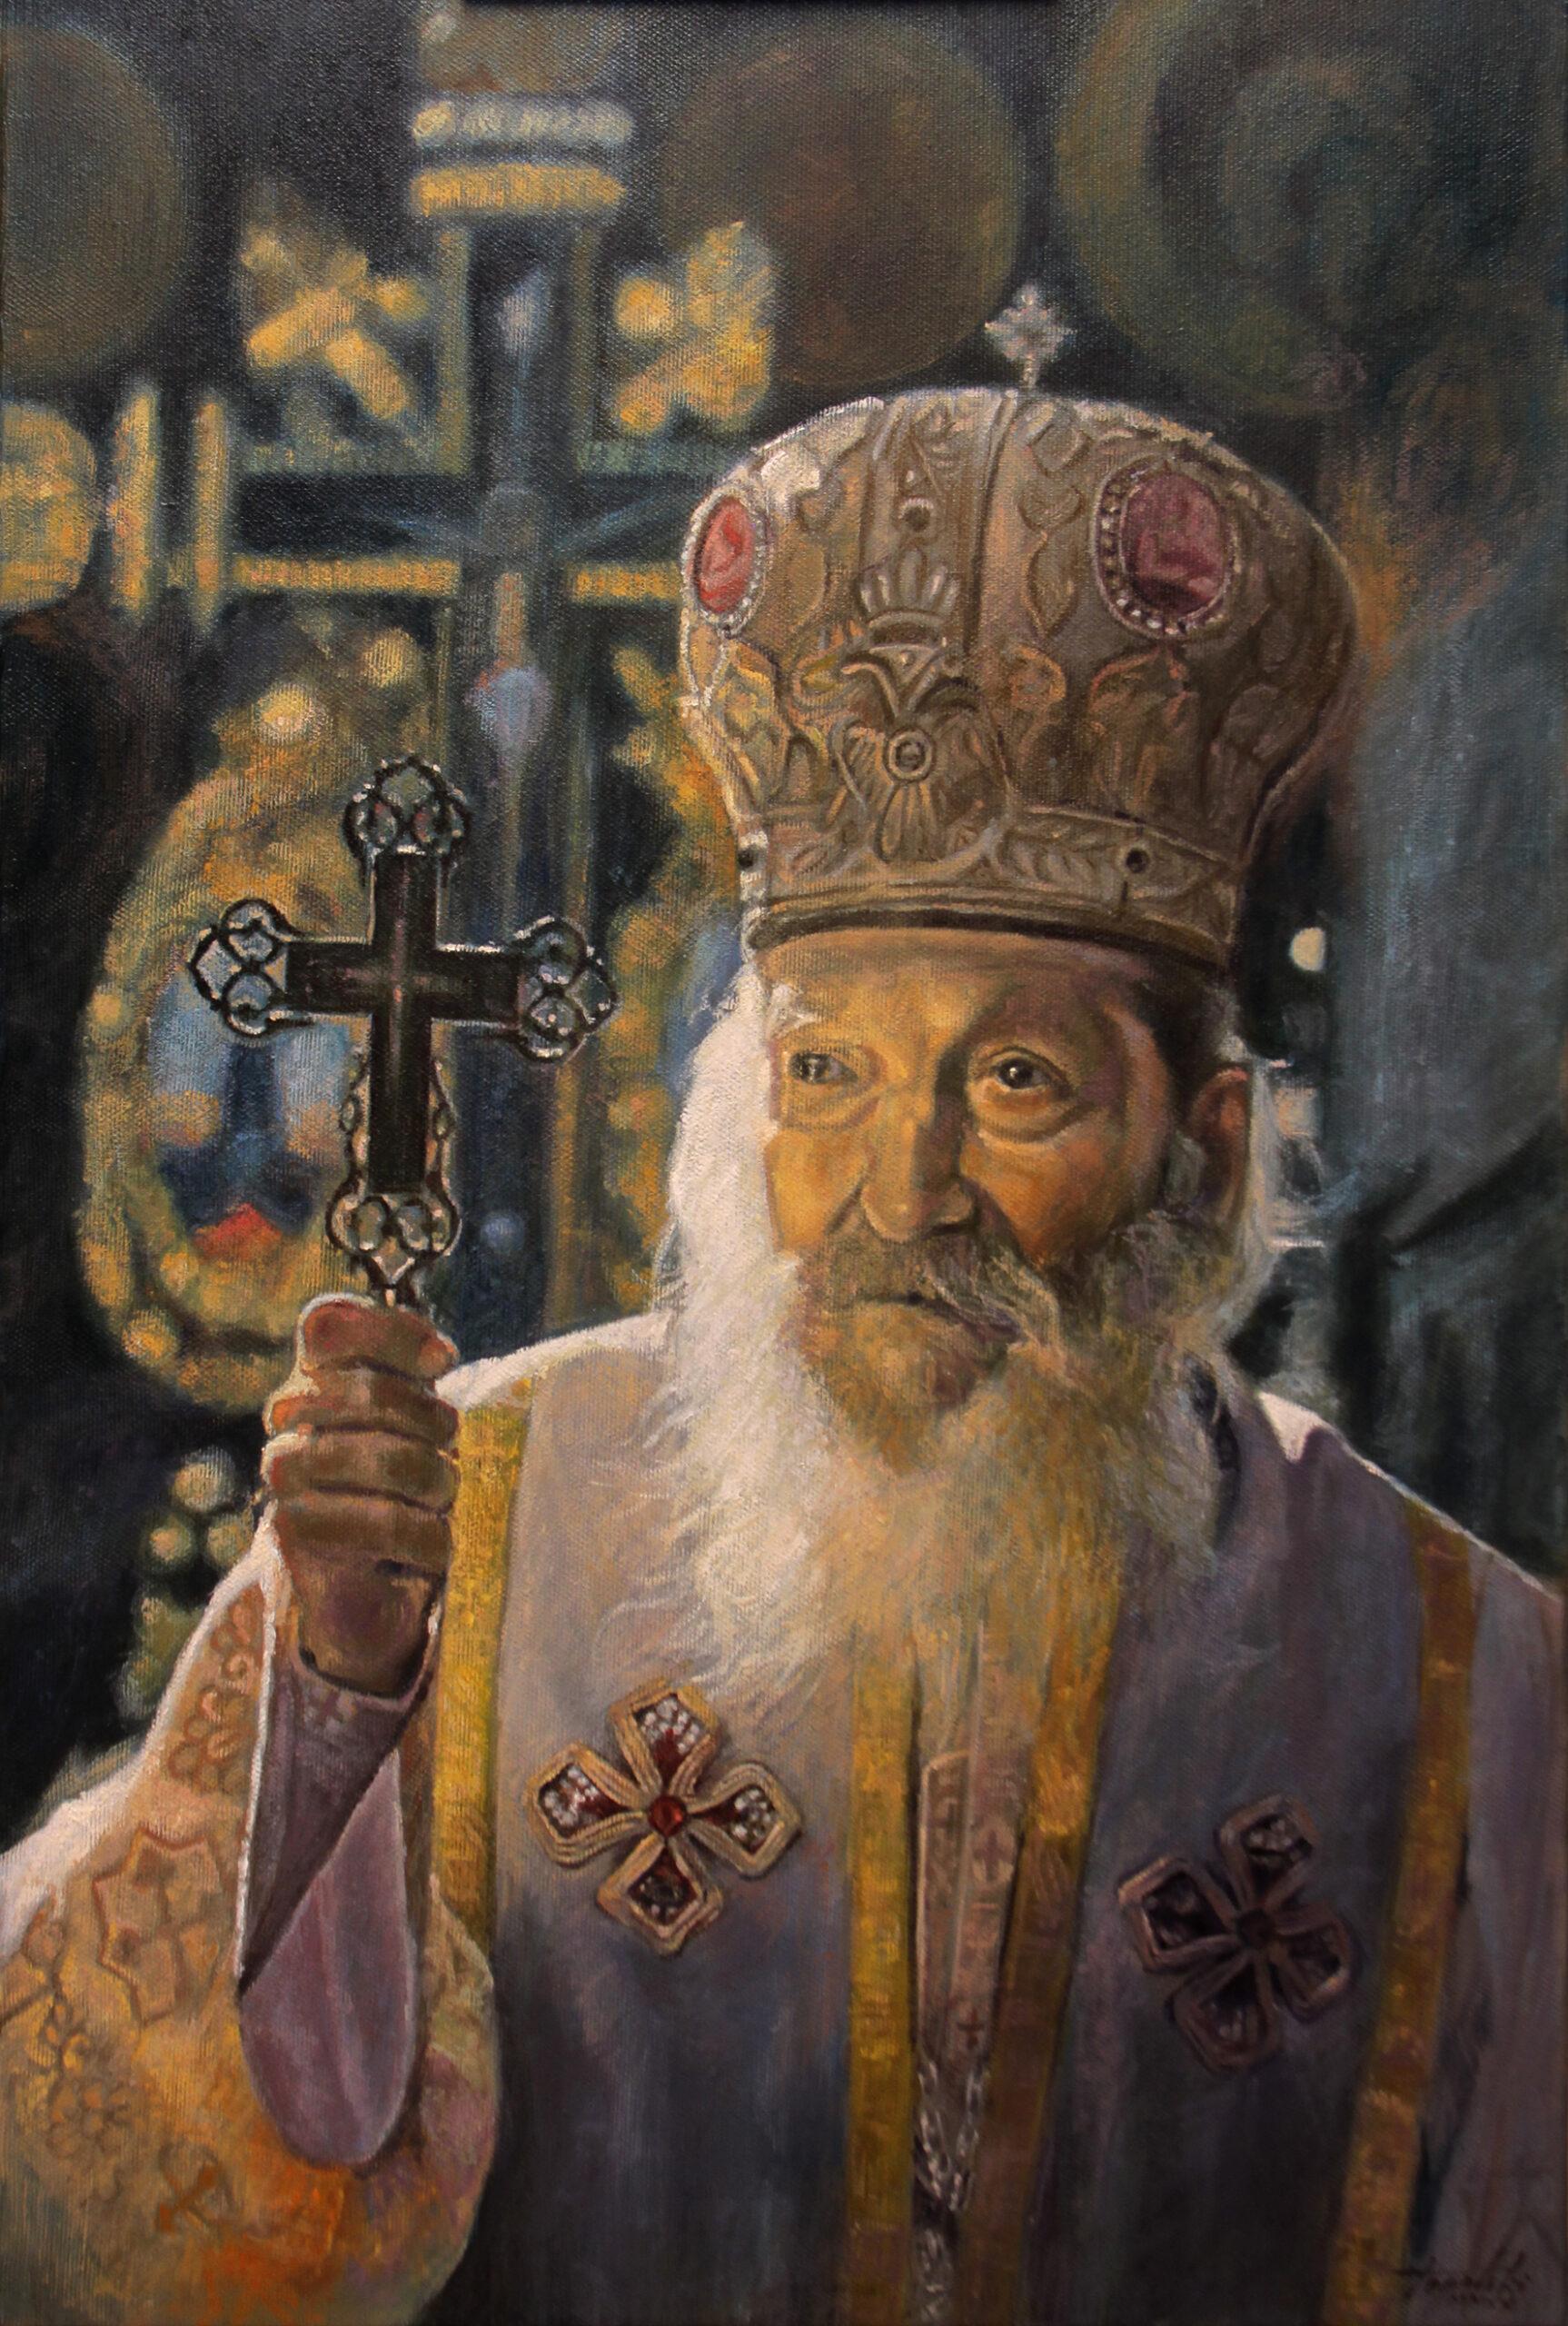 Српски Патријарх Павле - уље на платну 60x40цм, 2020. аутор - сликар Дарко Топалски